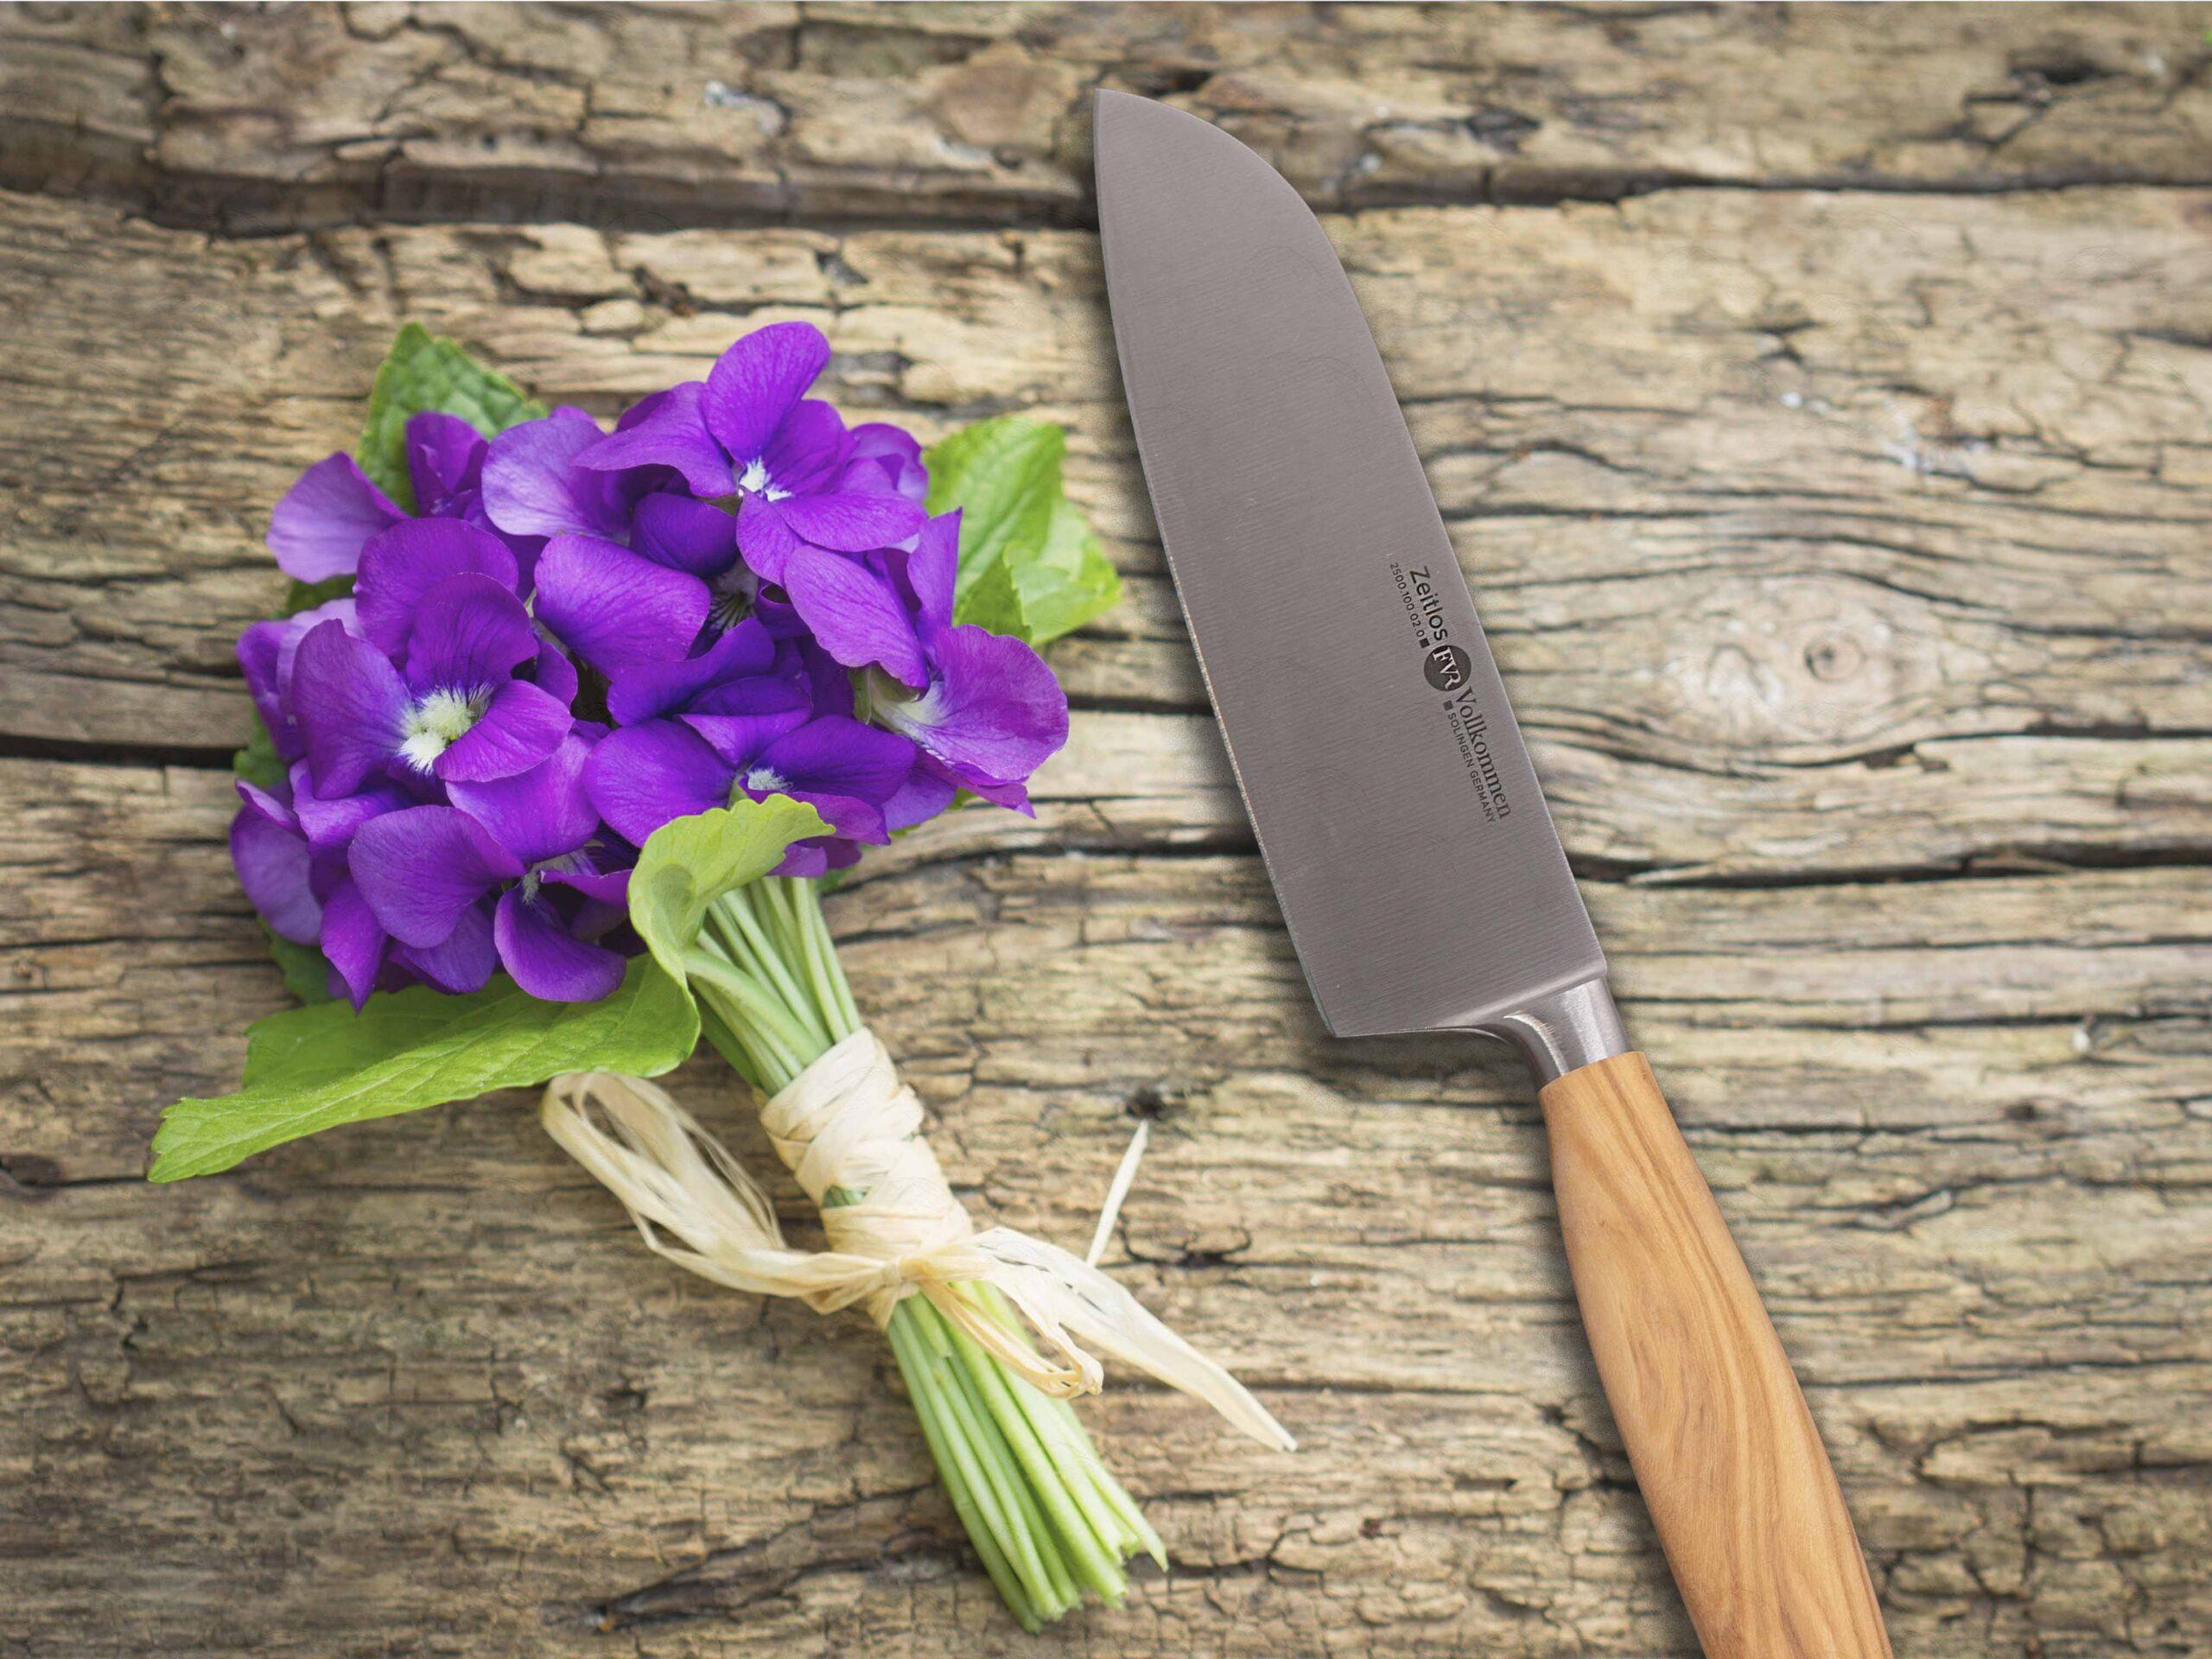 edible violets fvr